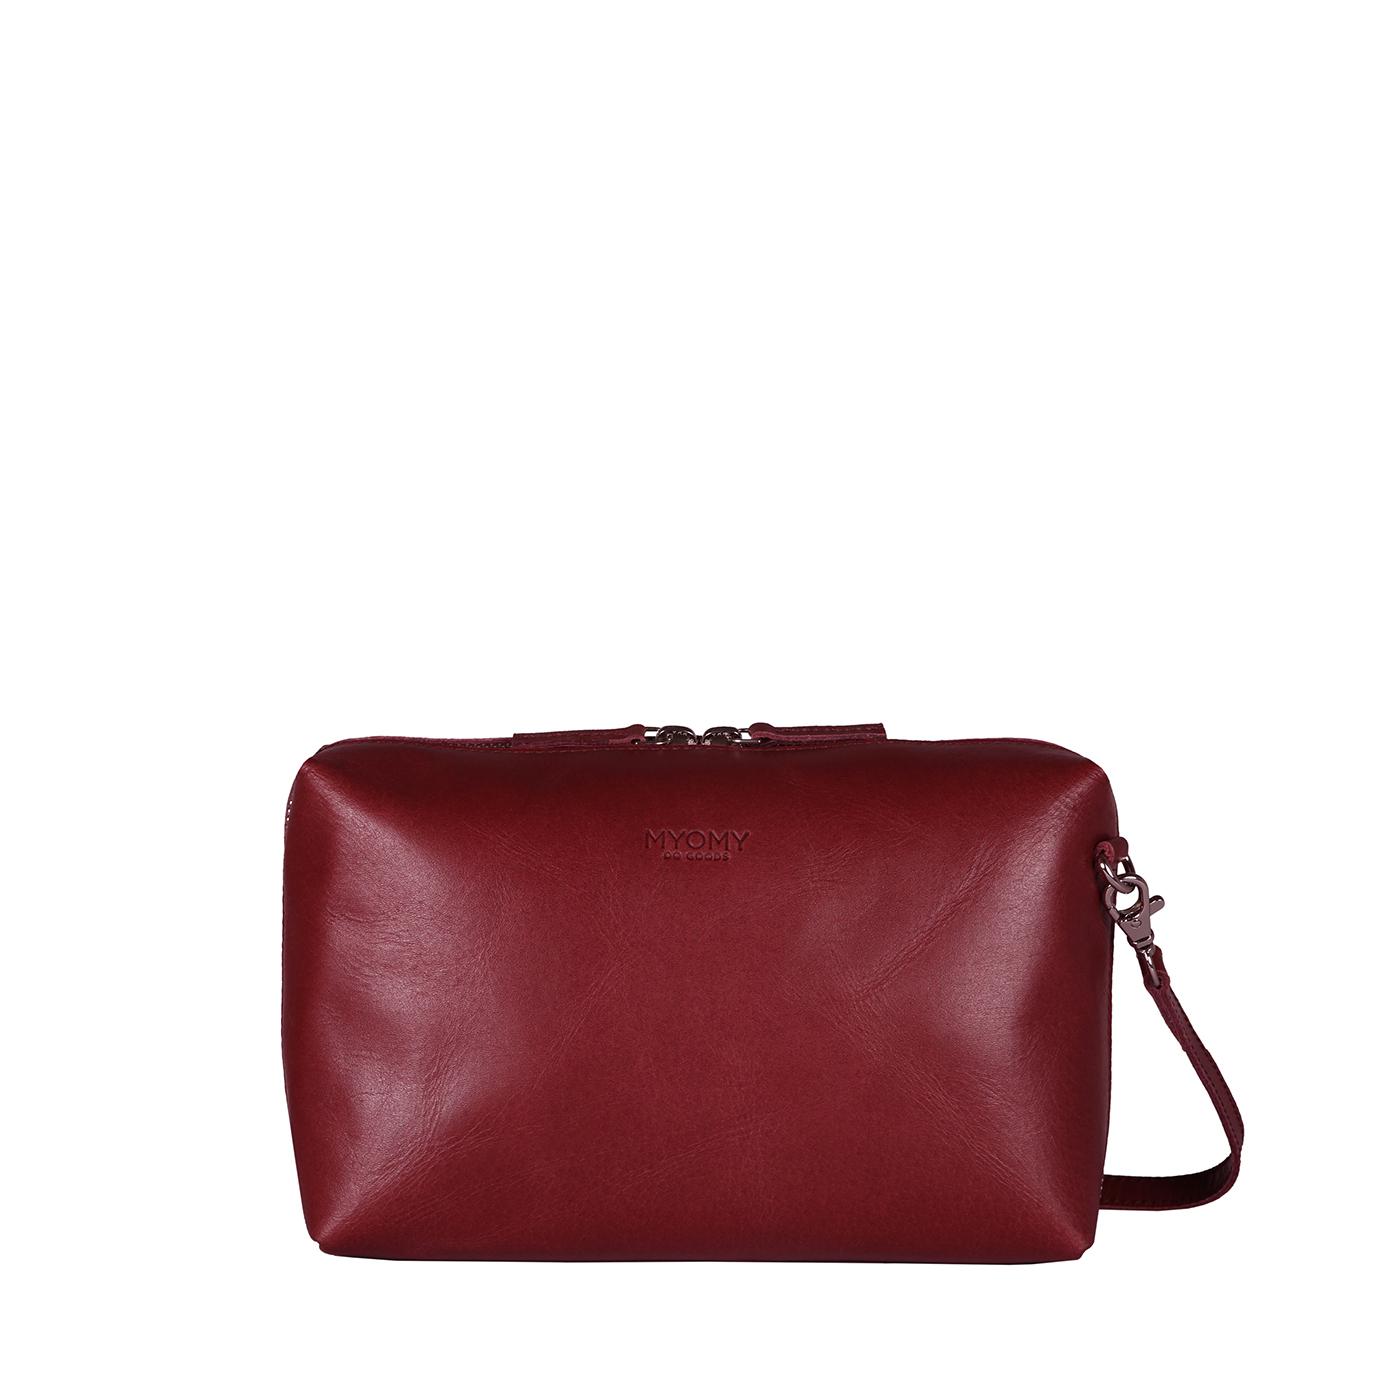 MY BOXY BAG Handbag - hunter waxy burgundy